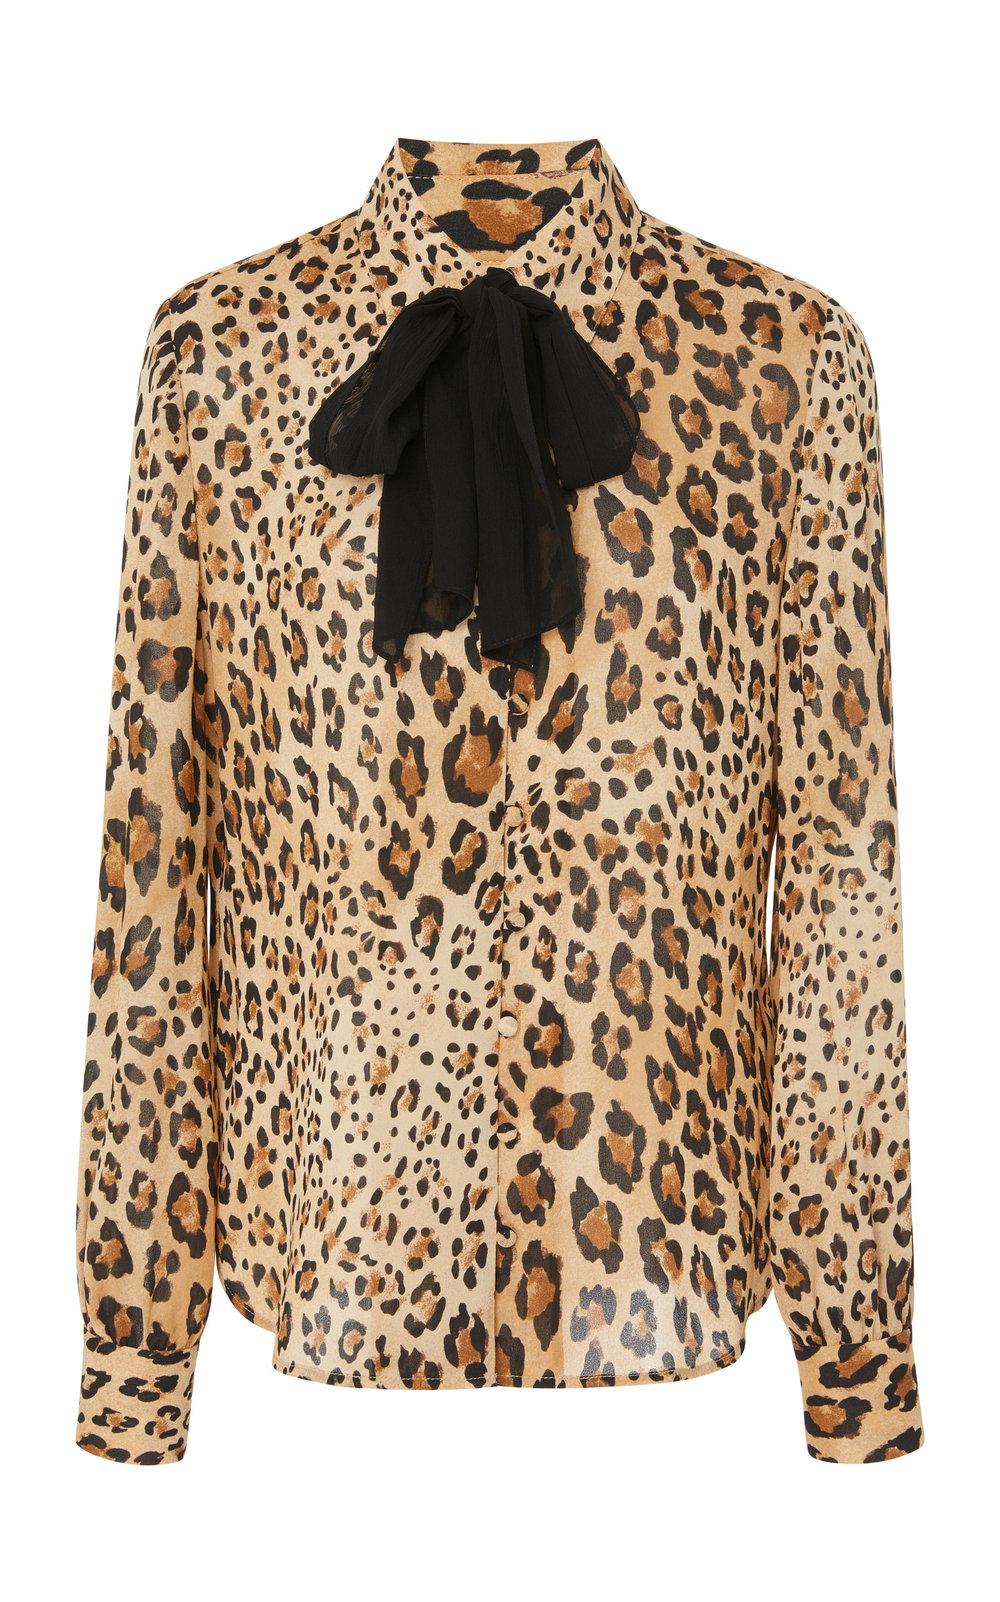 large_frame-denim-animal-pussy-bow-leopard-print-silk-chiffon-blouse.jpg